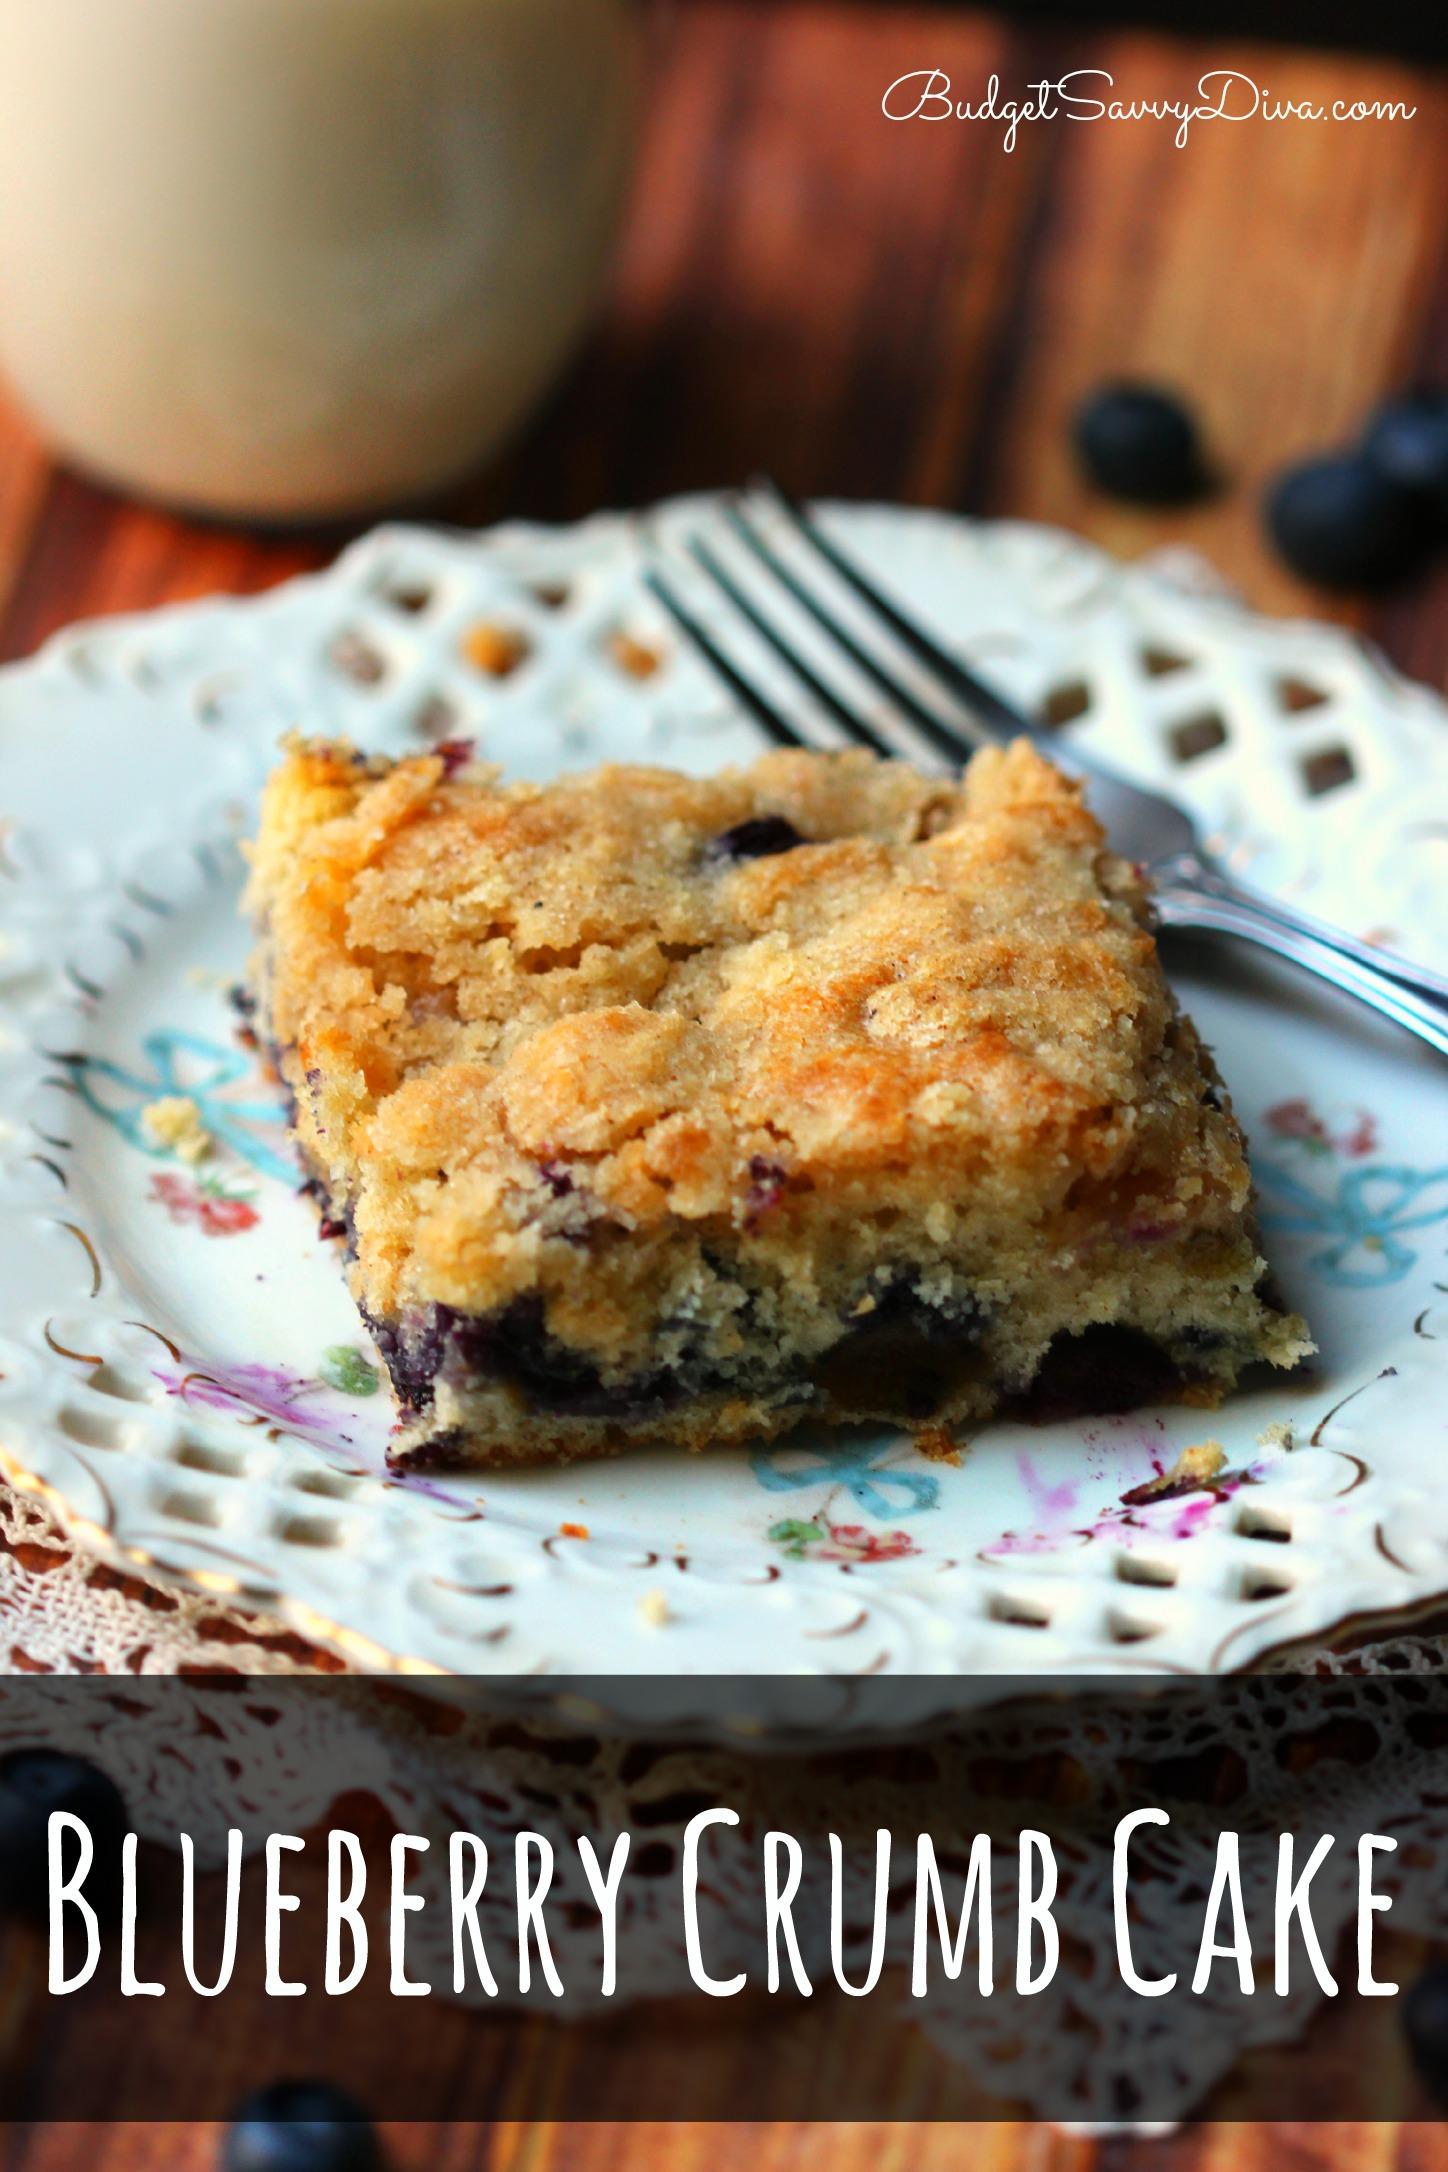 Blueberry Crumb Cake Recipe | Budget Savvy Diva